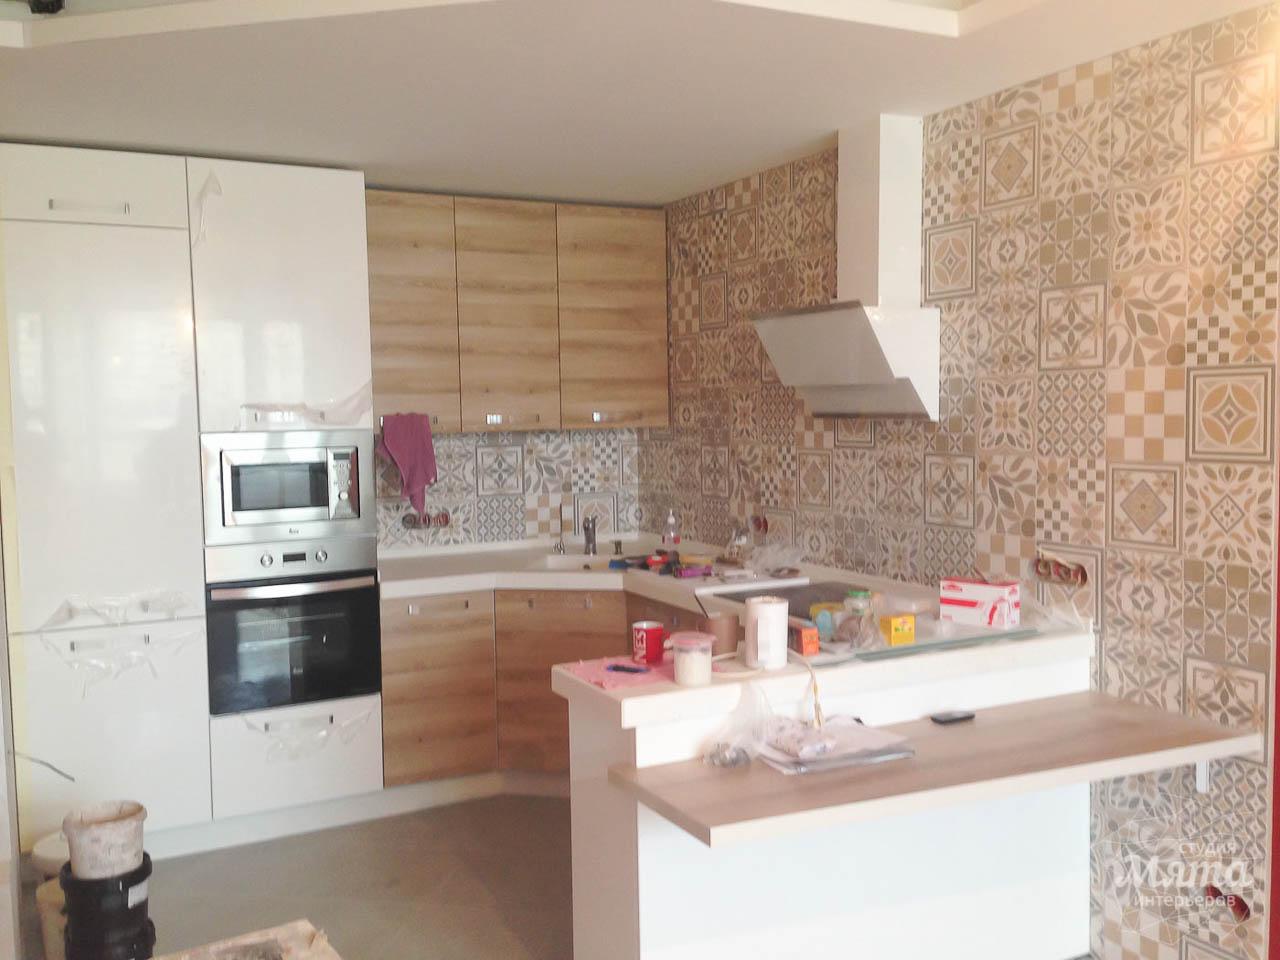 Дизайн интерьера и ремонт трехкомнатной квартиры по ул. Фучика 9 51